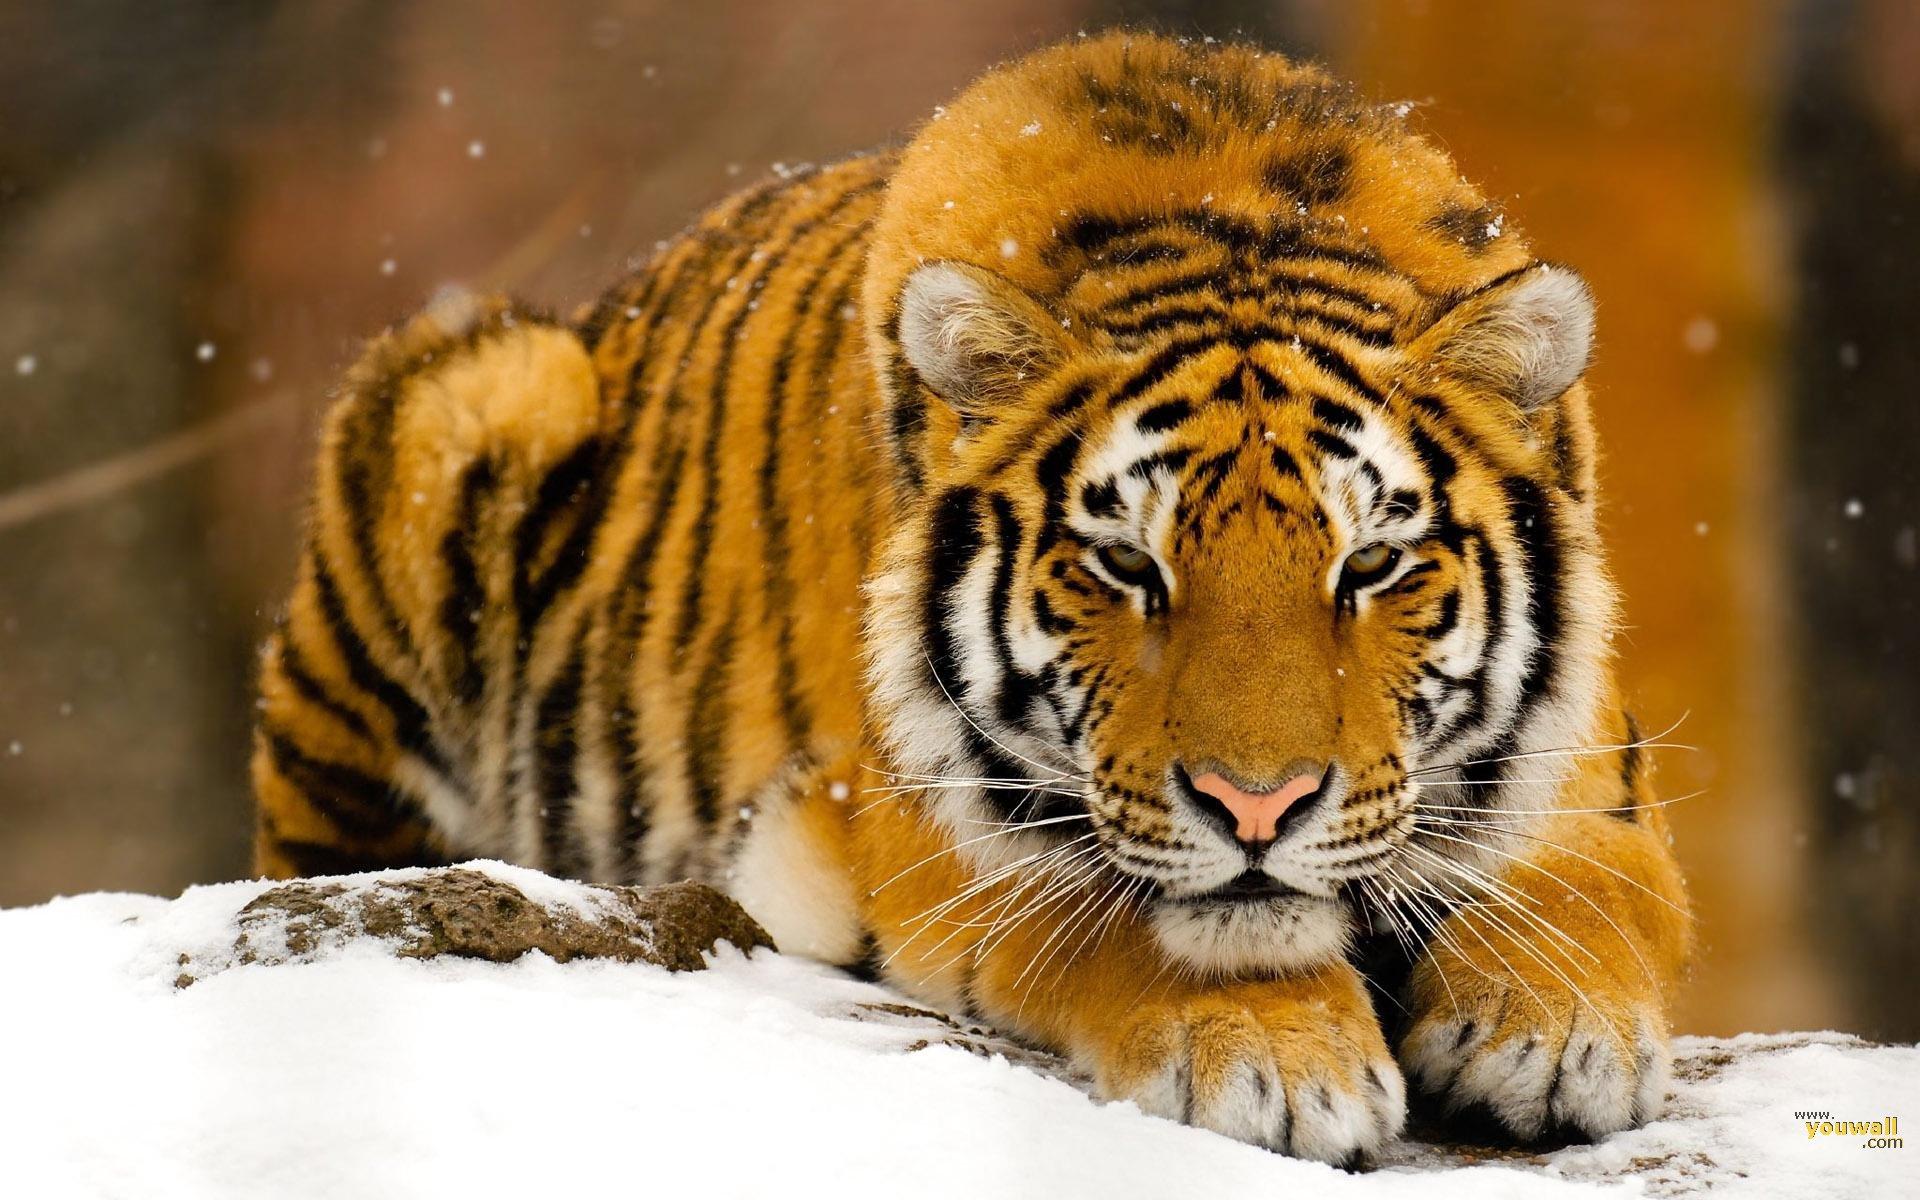 Tiger Art Wallpaper Jpg 960 800: Golden Tiger Wallpaper - HD Desktop Wallpapers